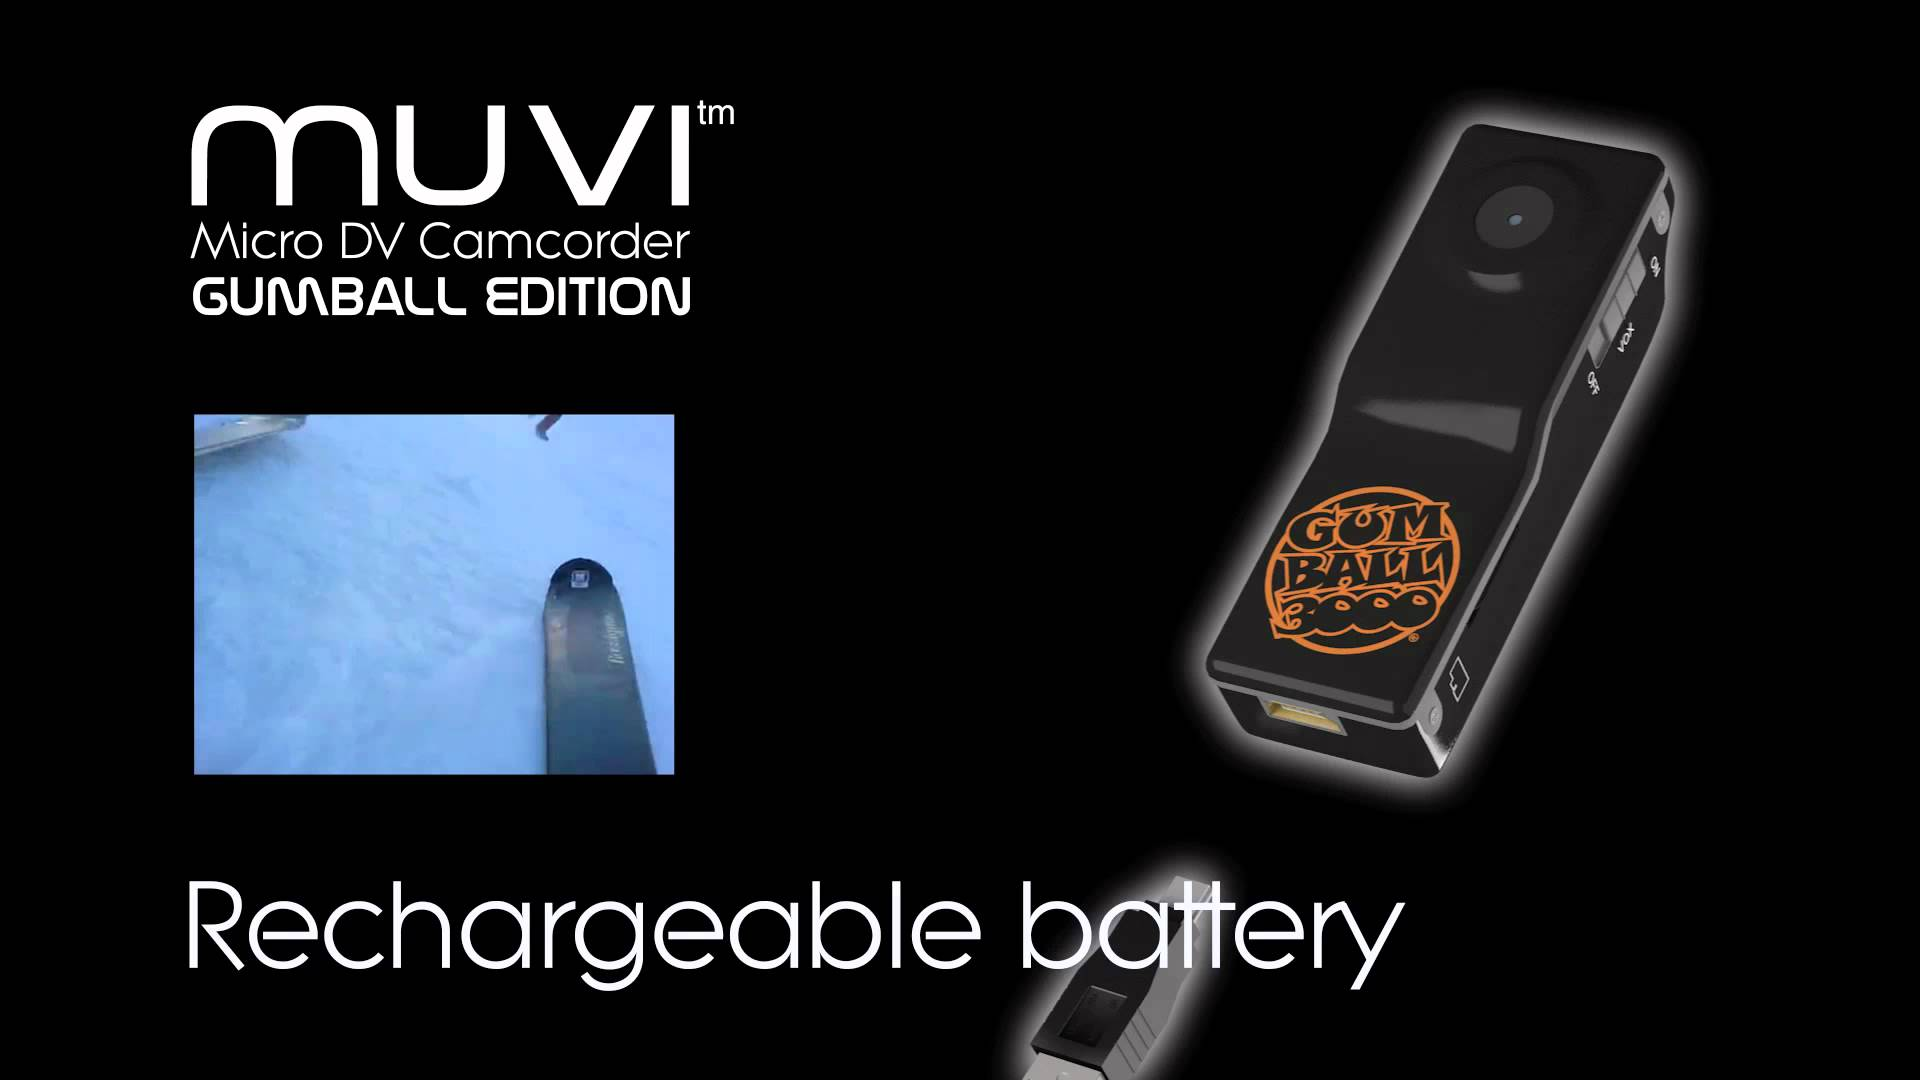 Veho VCC-003-GUM Gumball Edition Muvi Micro Camcorder Bundle